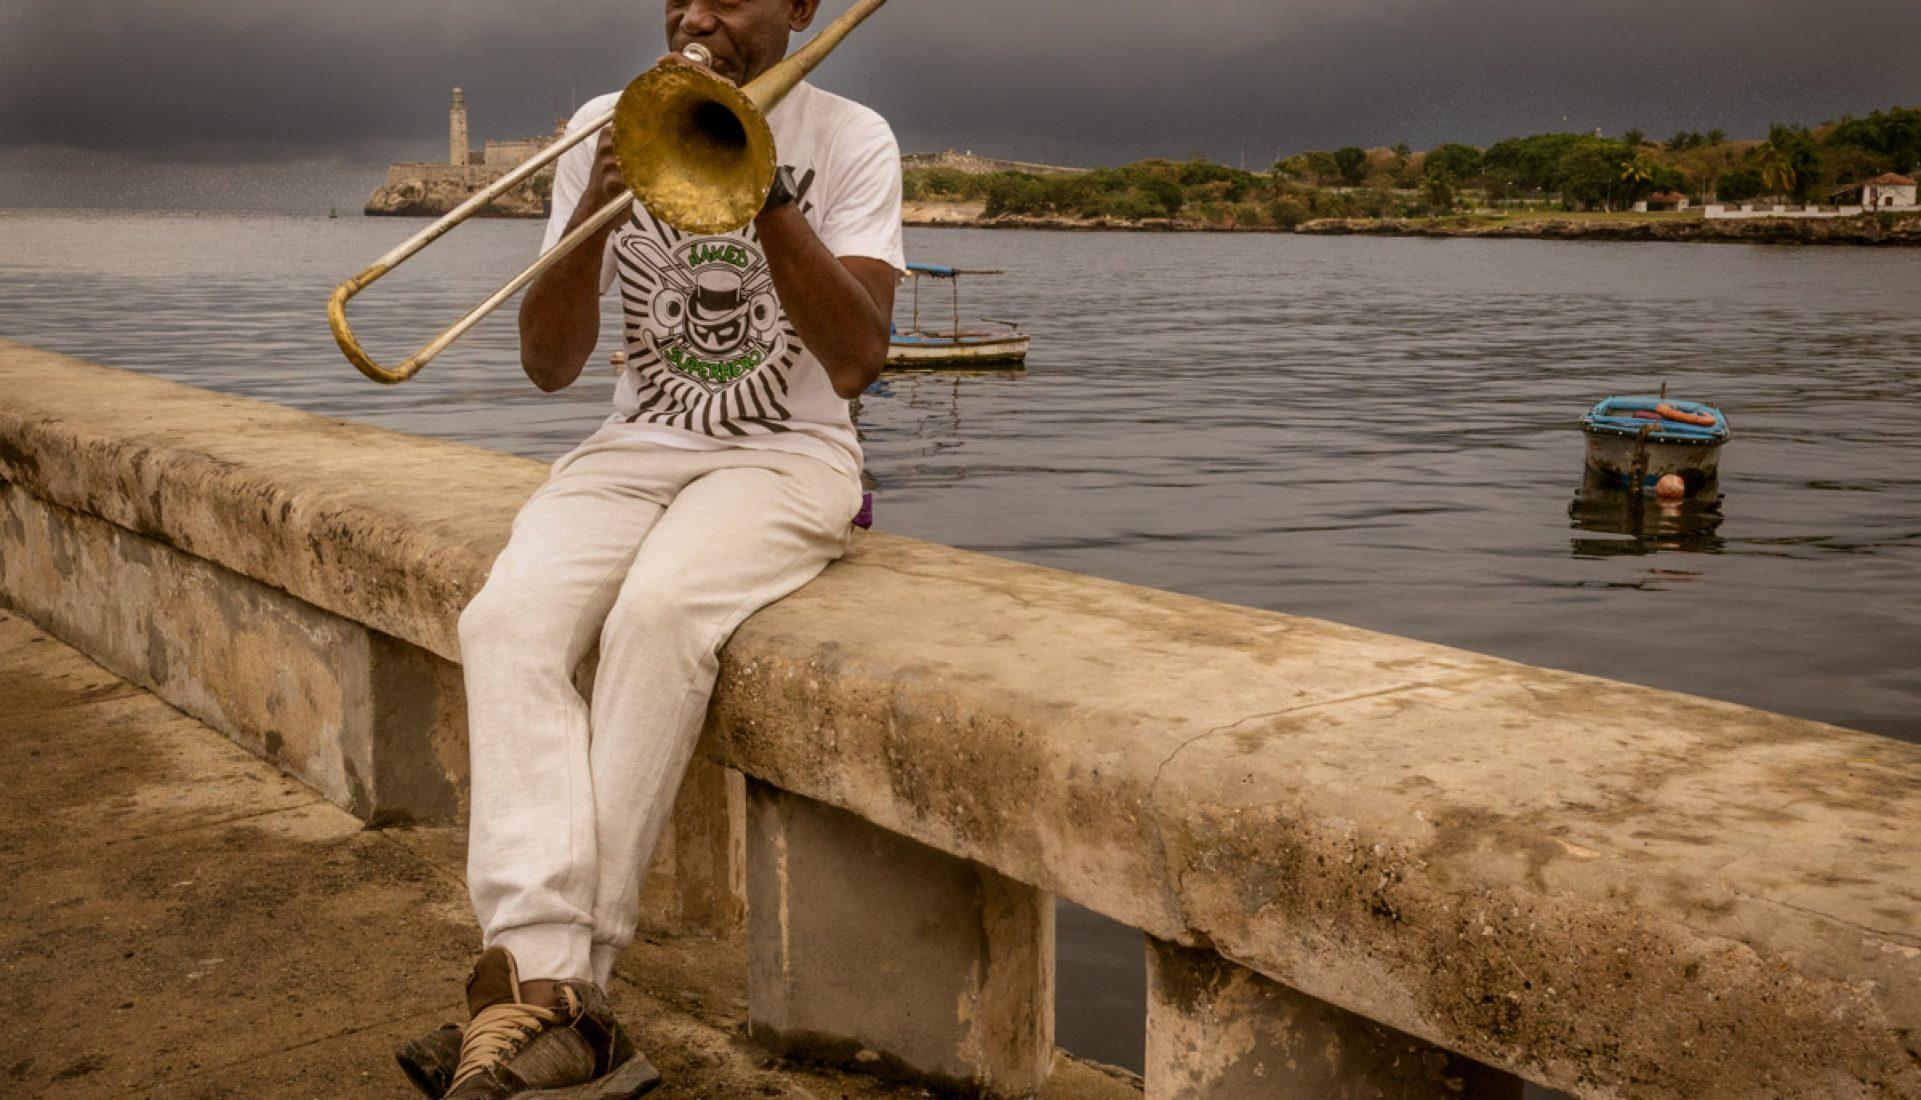 Soulful Havana